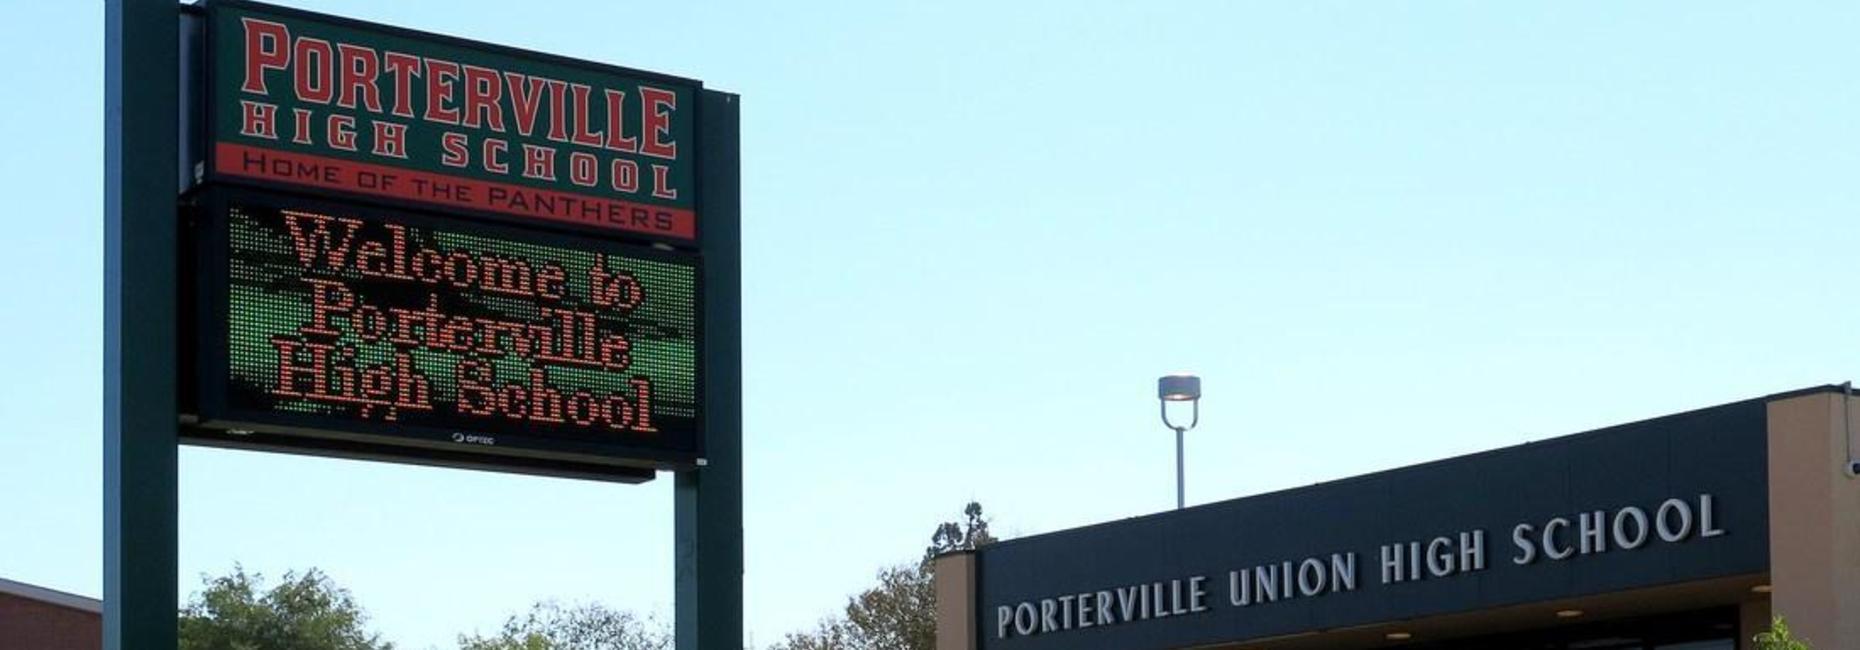 Porterville High